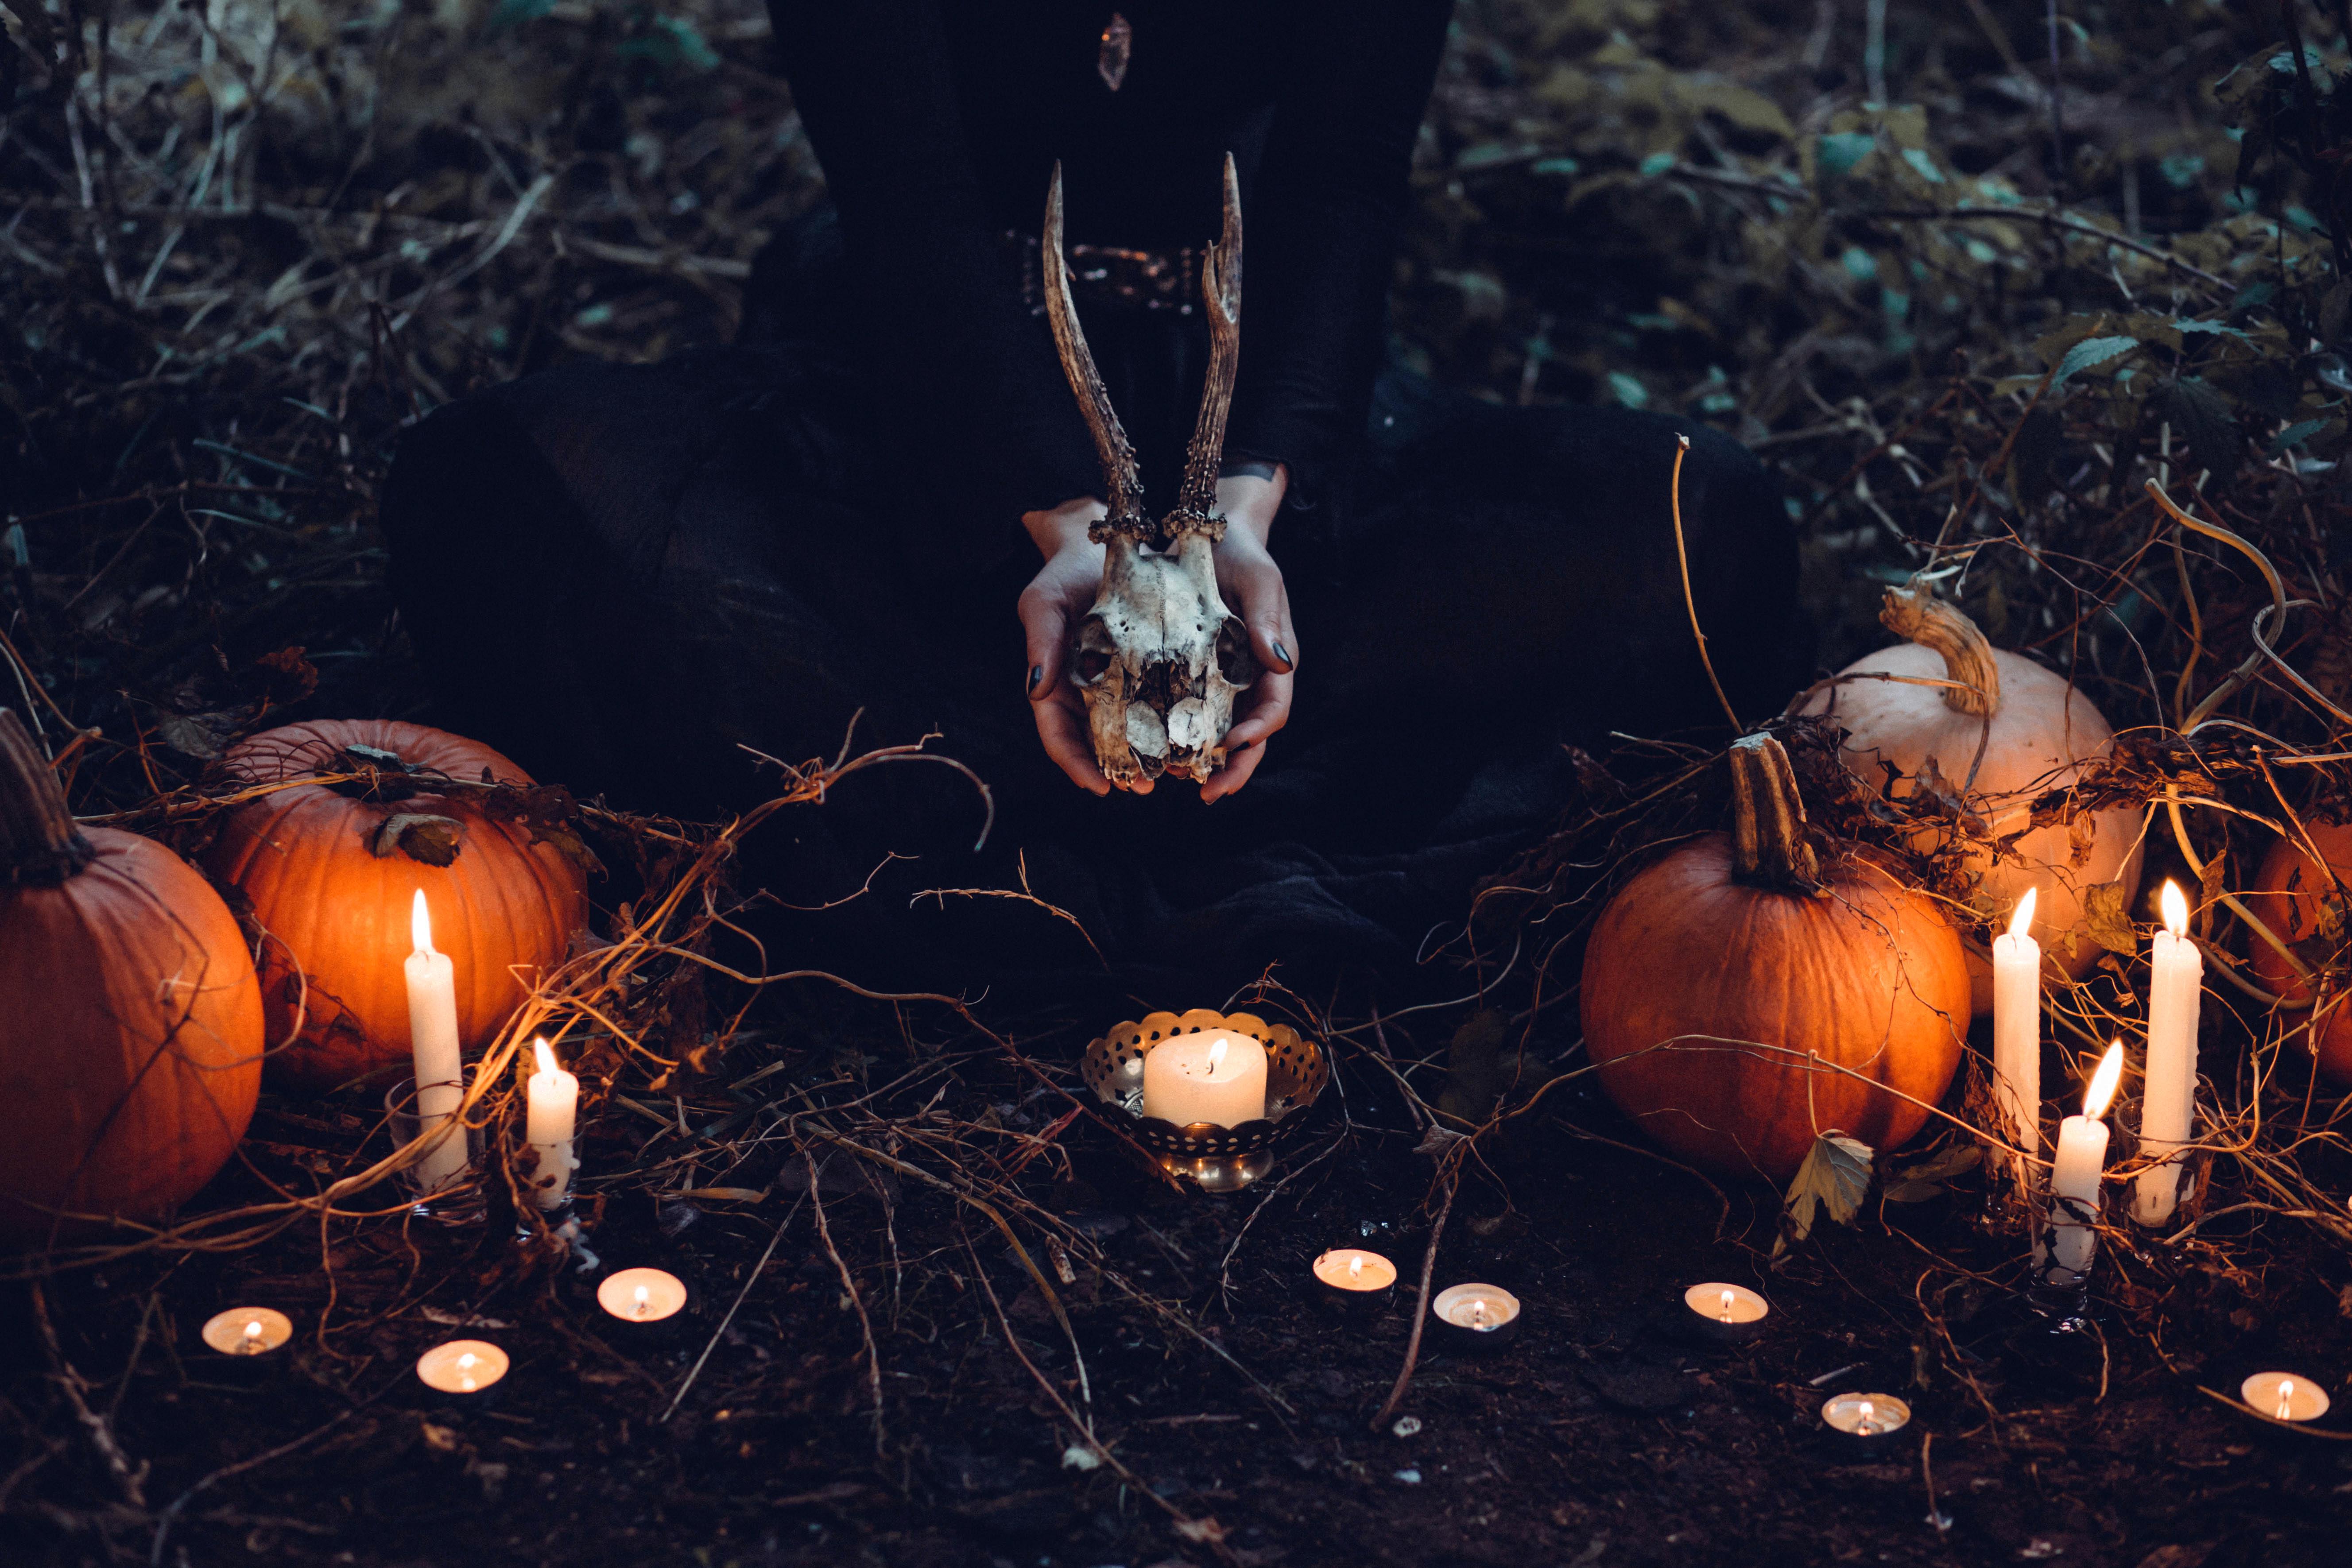 Brown Pumpkin Halloween Decor and Gray Skull at Grass Field · Free ...